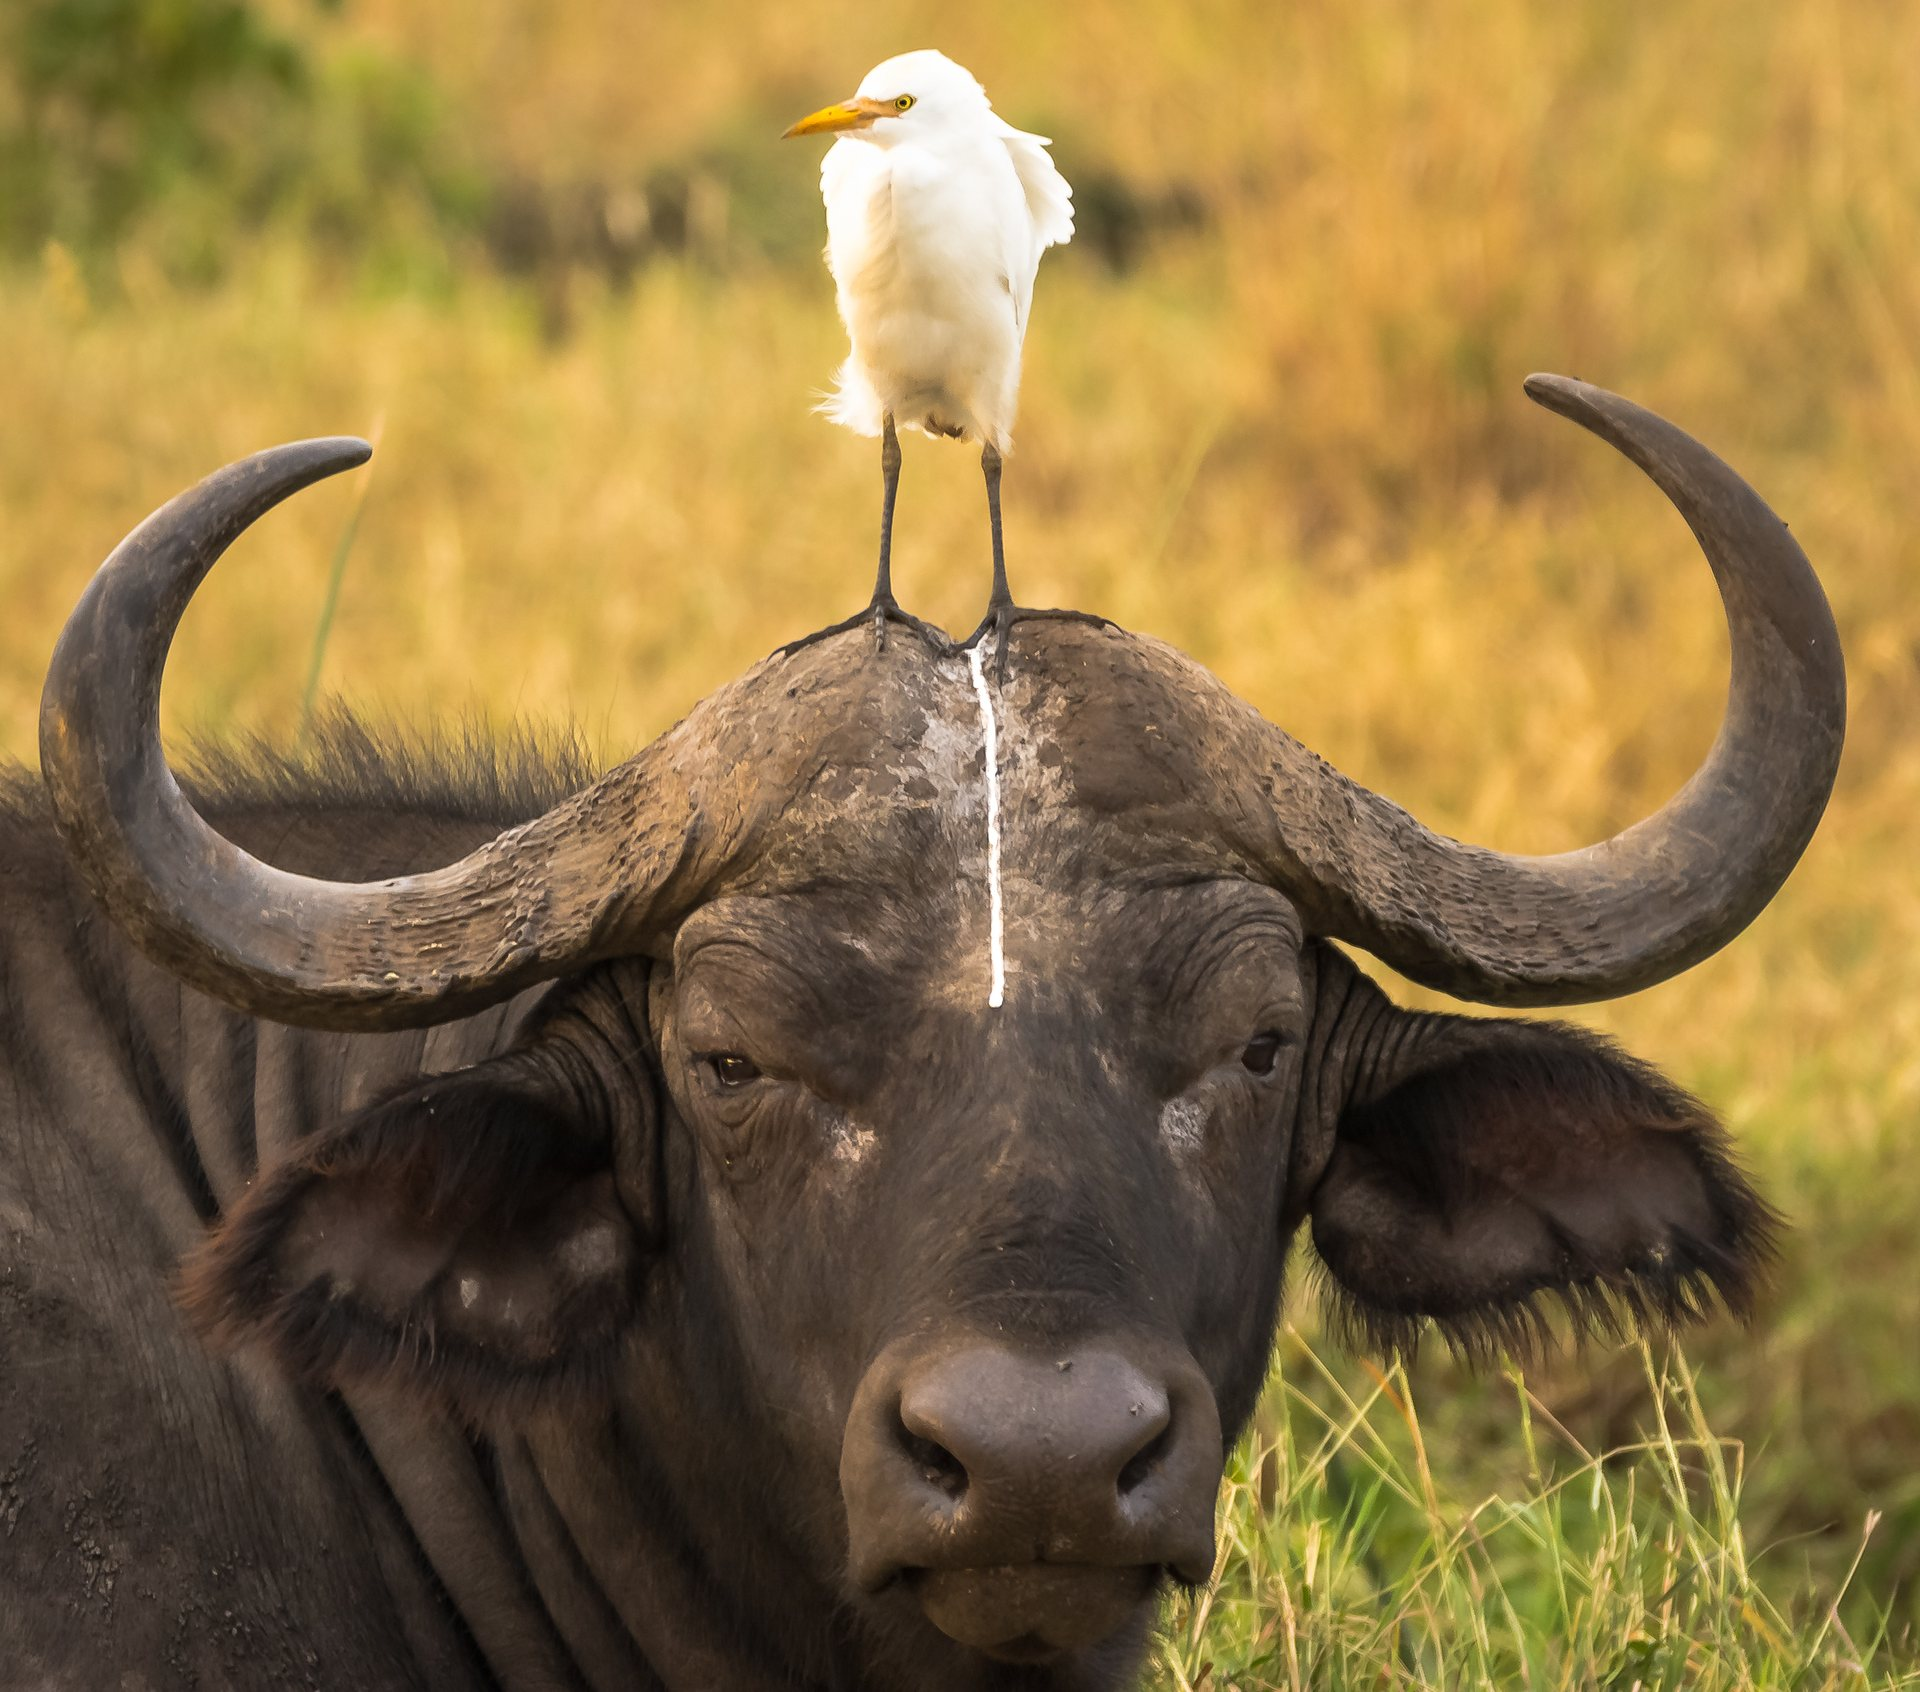 Tο ατυχές πορτρέτο ενός αφρικανικού βούβαλου, Κένυα. Φωτογραφία: Tom Stables/The Comedy Wildlife Photography Awards.